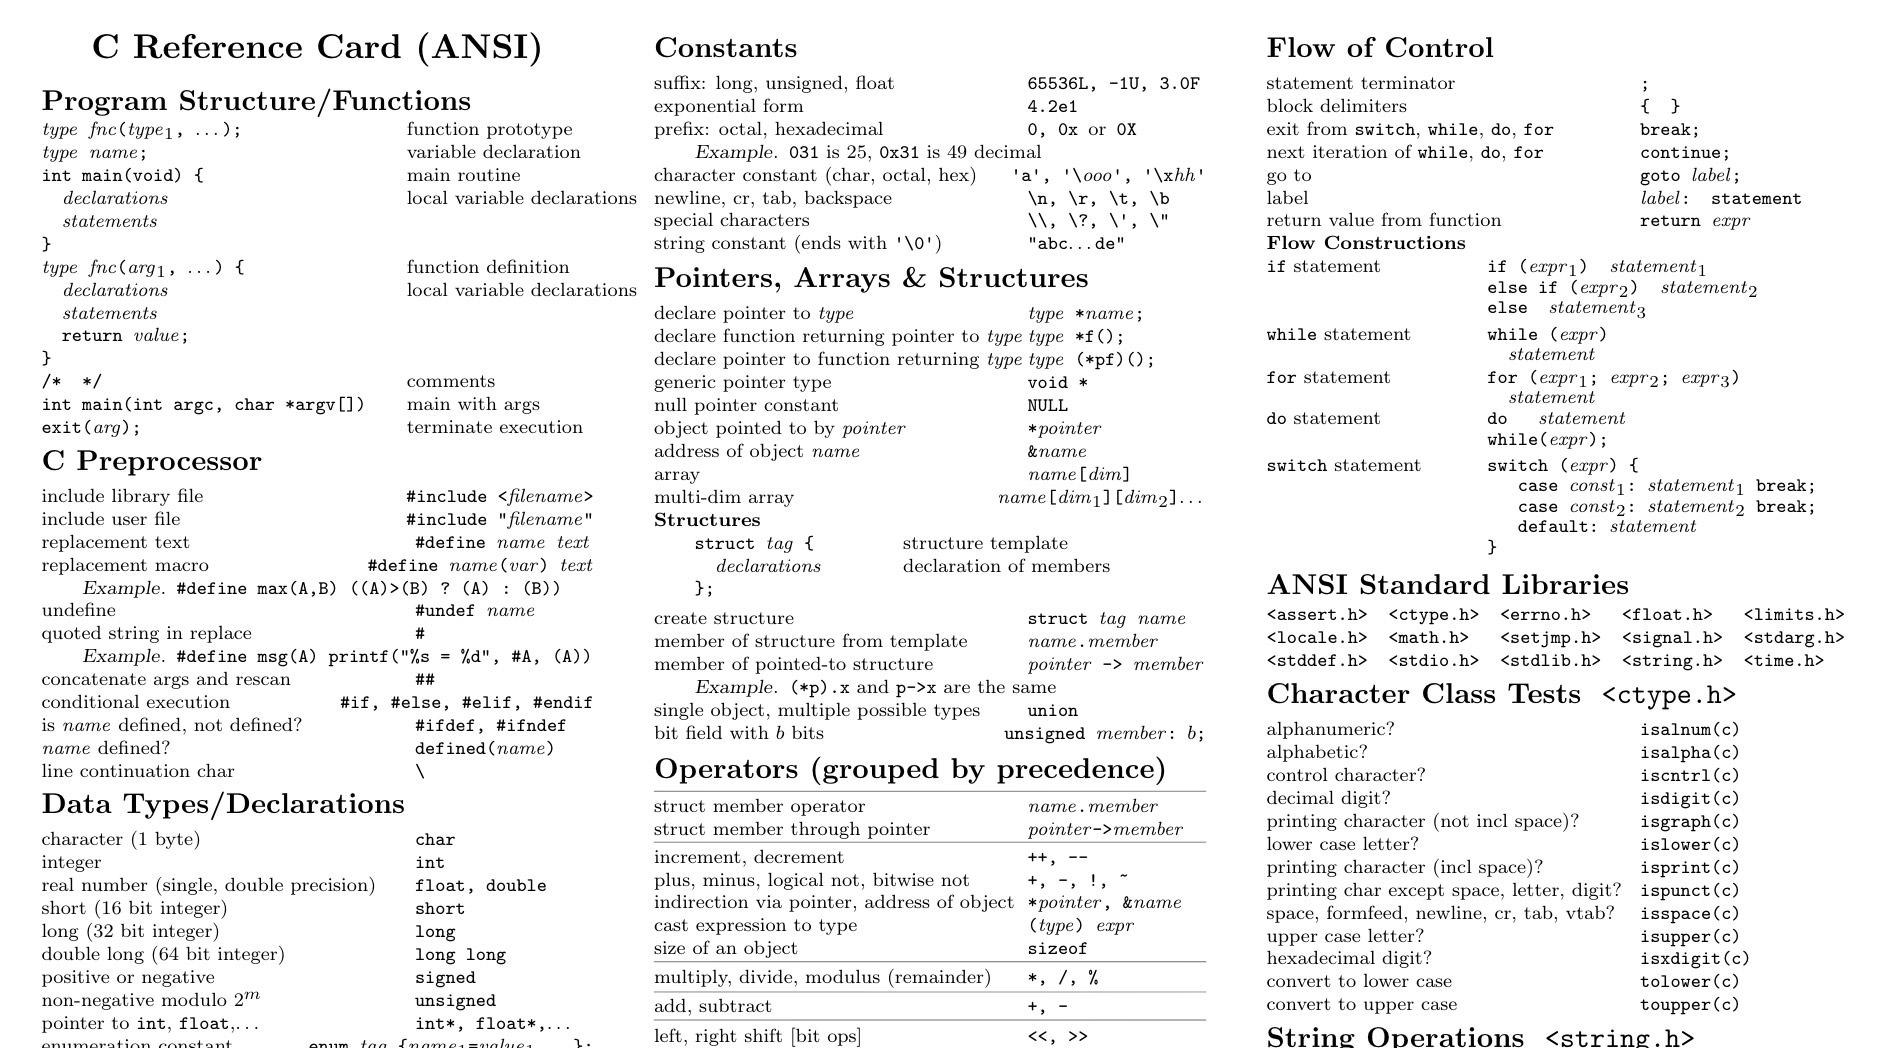 C-Reference-Card-ANSI